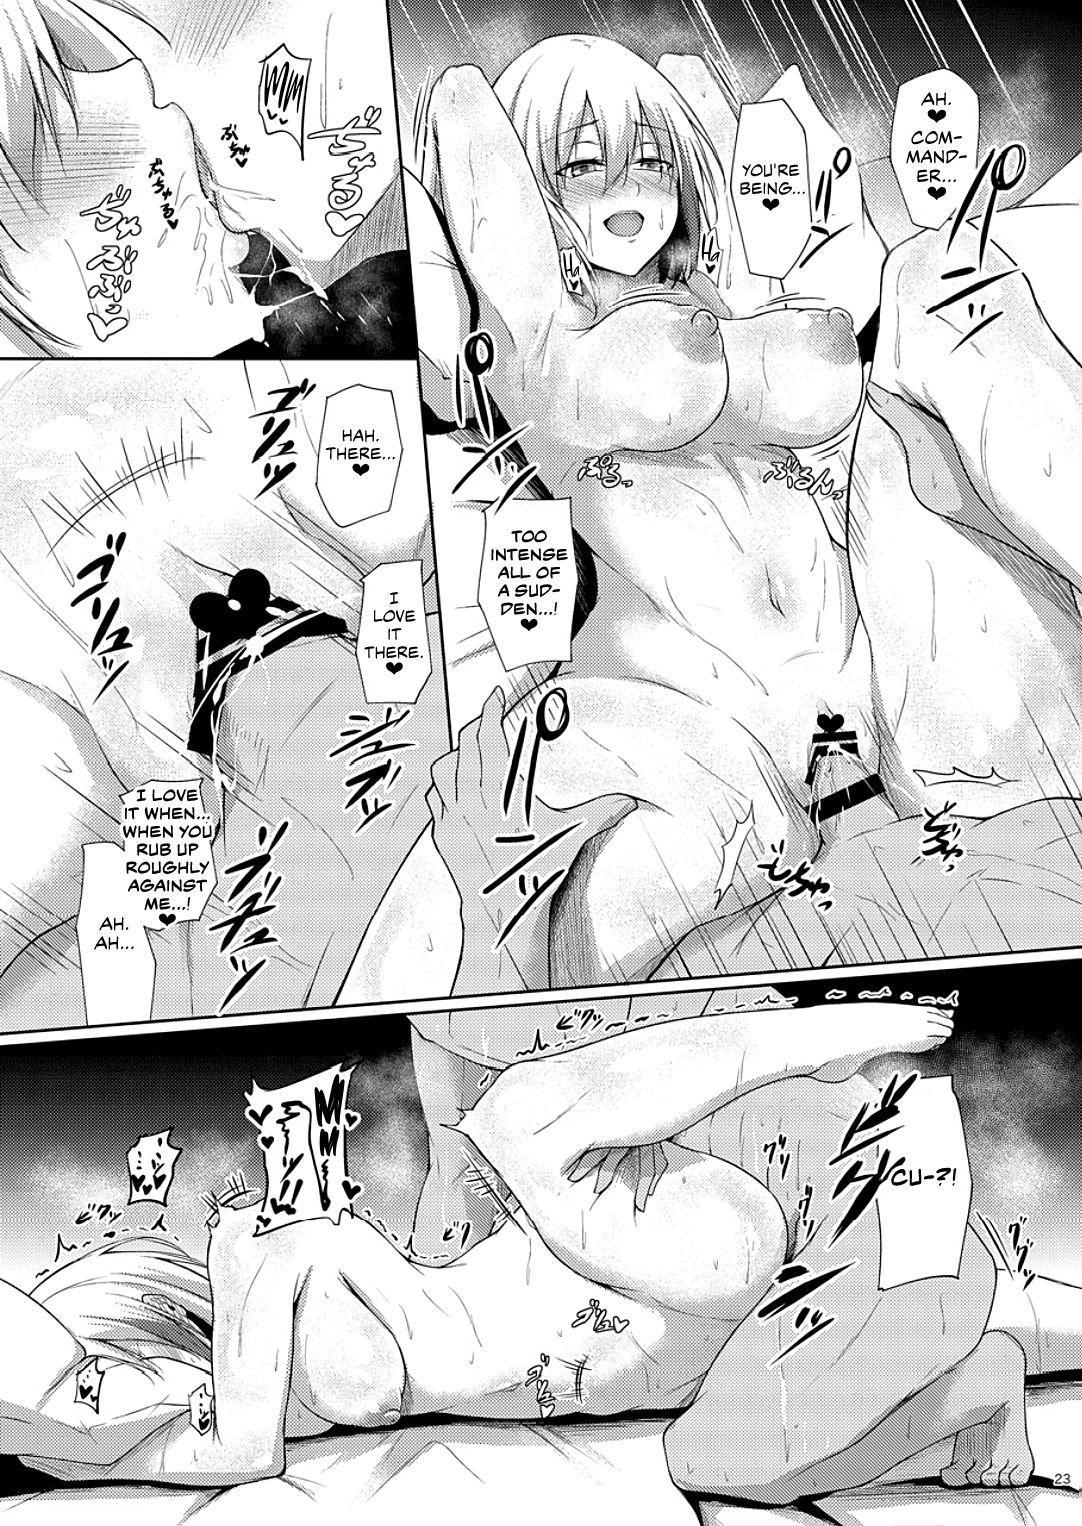 Afureru Kurai, Kimi ga Suki. San   My Overflowing Love For You 3 22